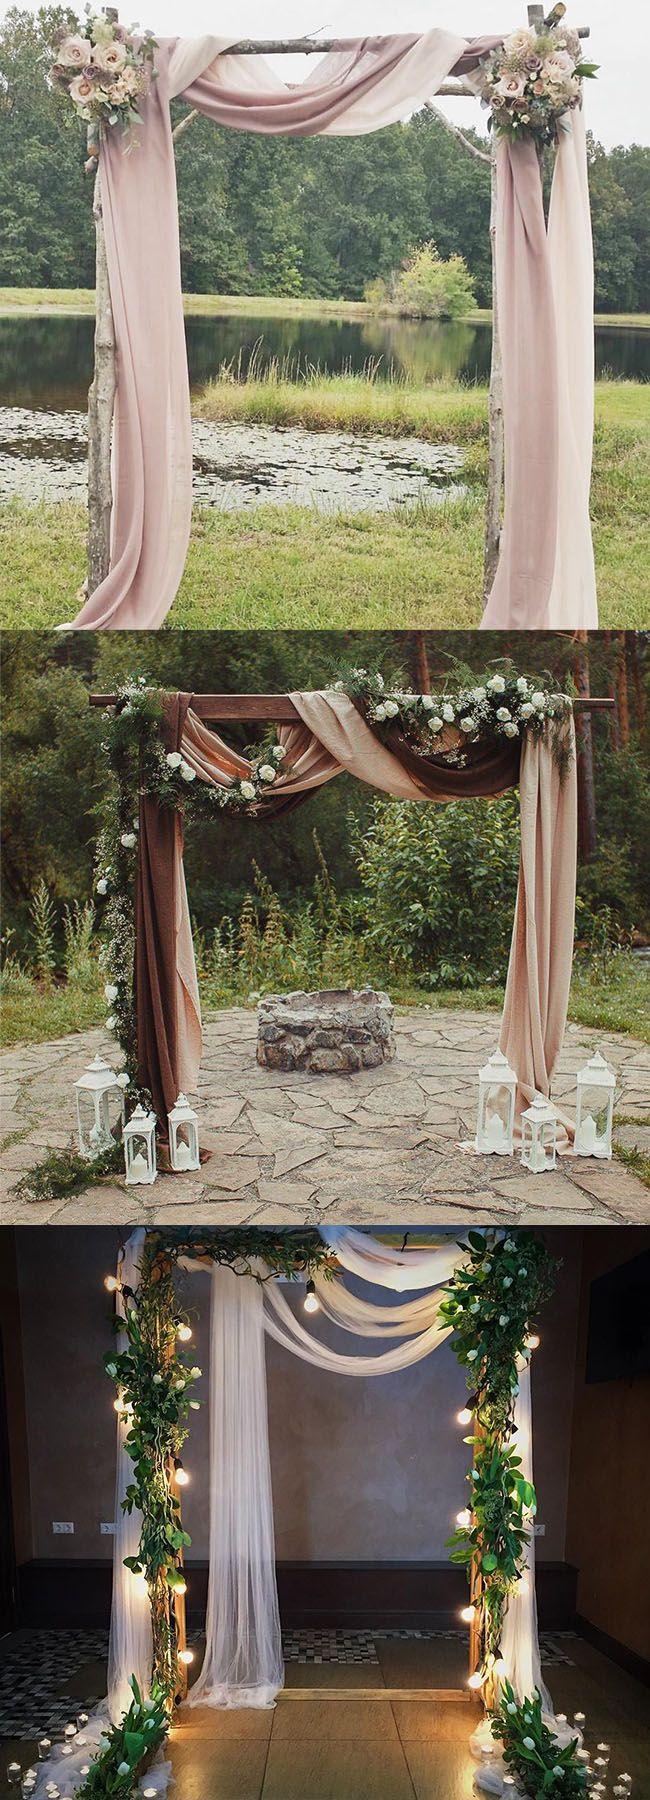 romantic drapery wedding arch decoration ideas